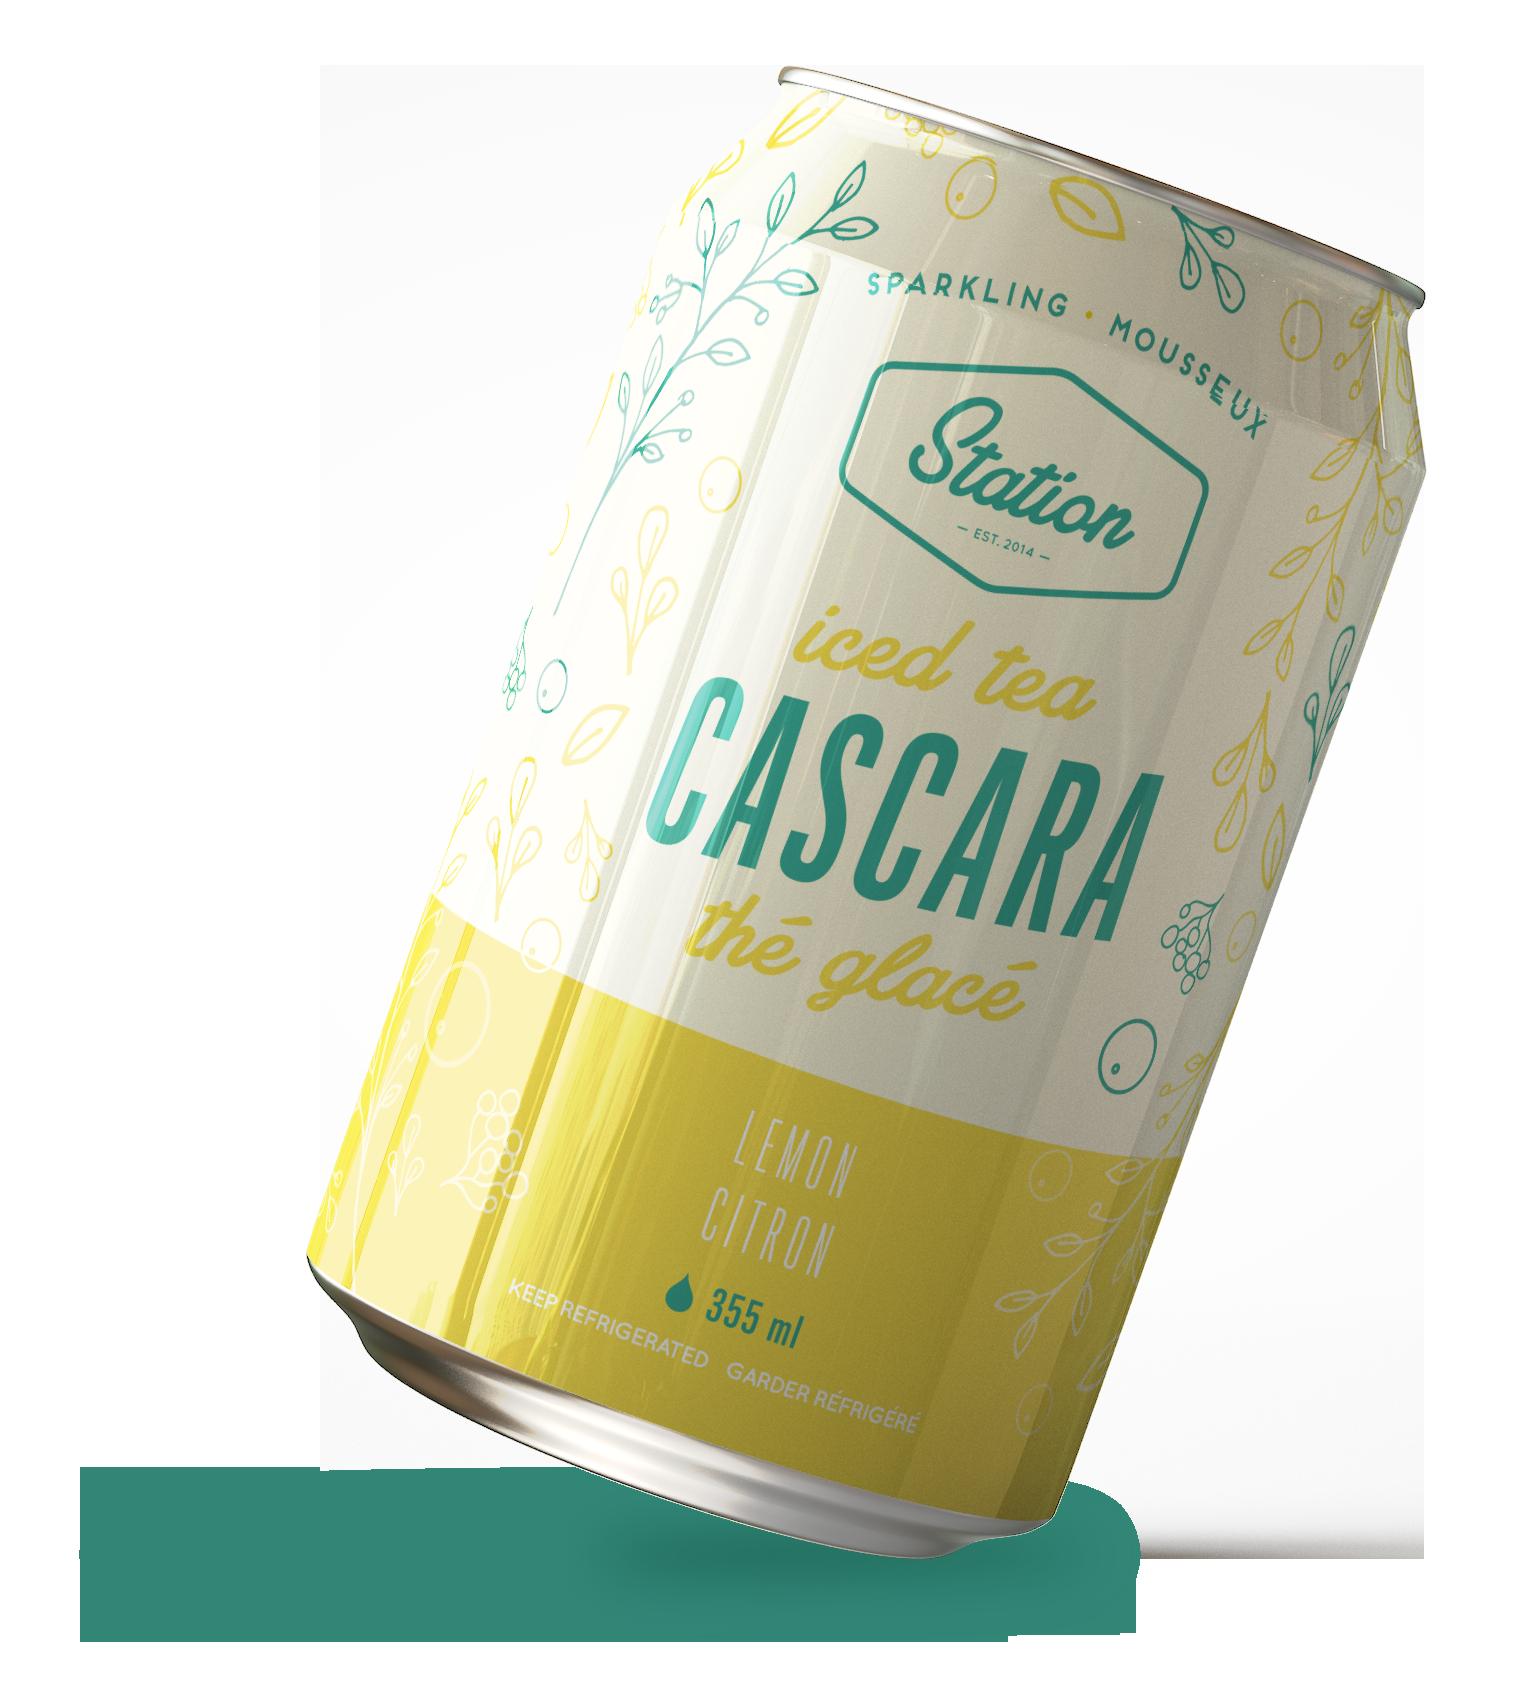 Cascara_lemon.png